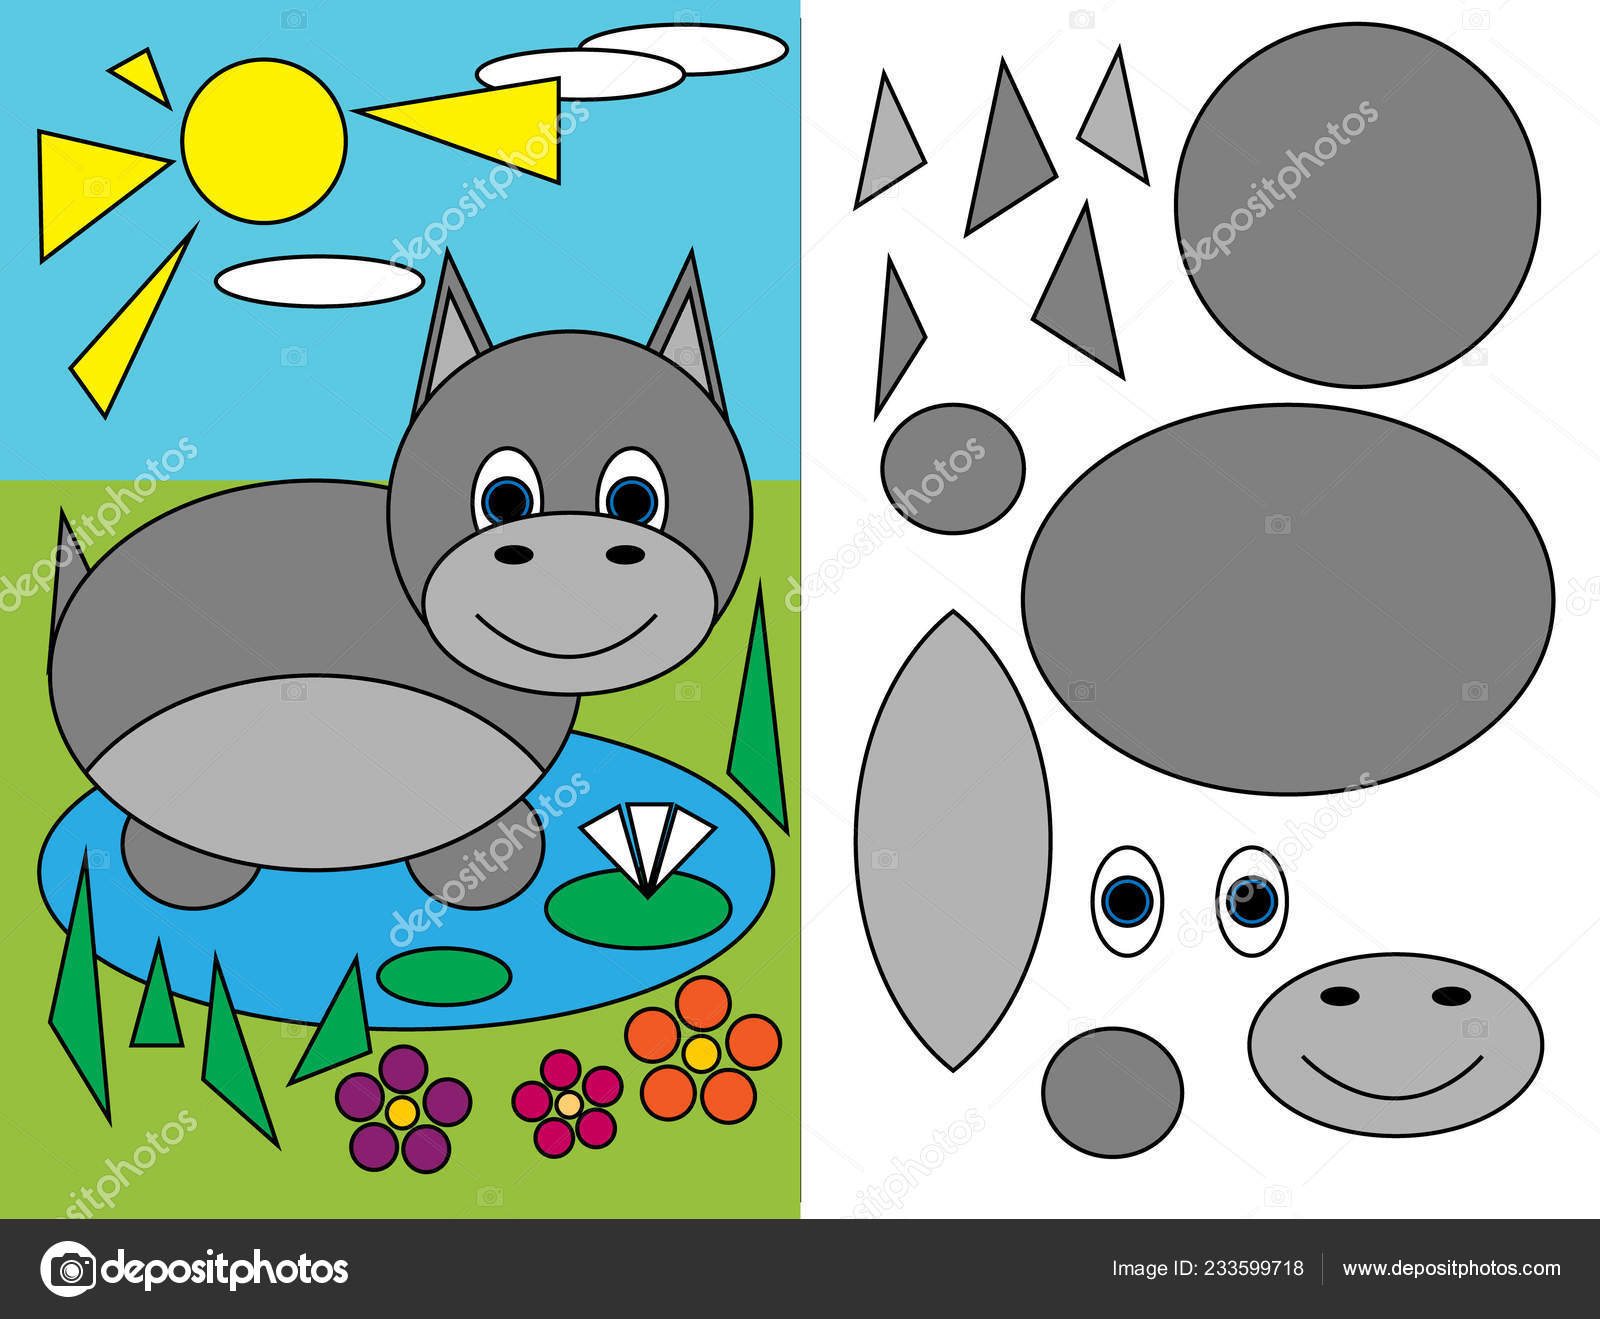 Applique Geometric Shapes Workbook Preschool Education Hippopotamus